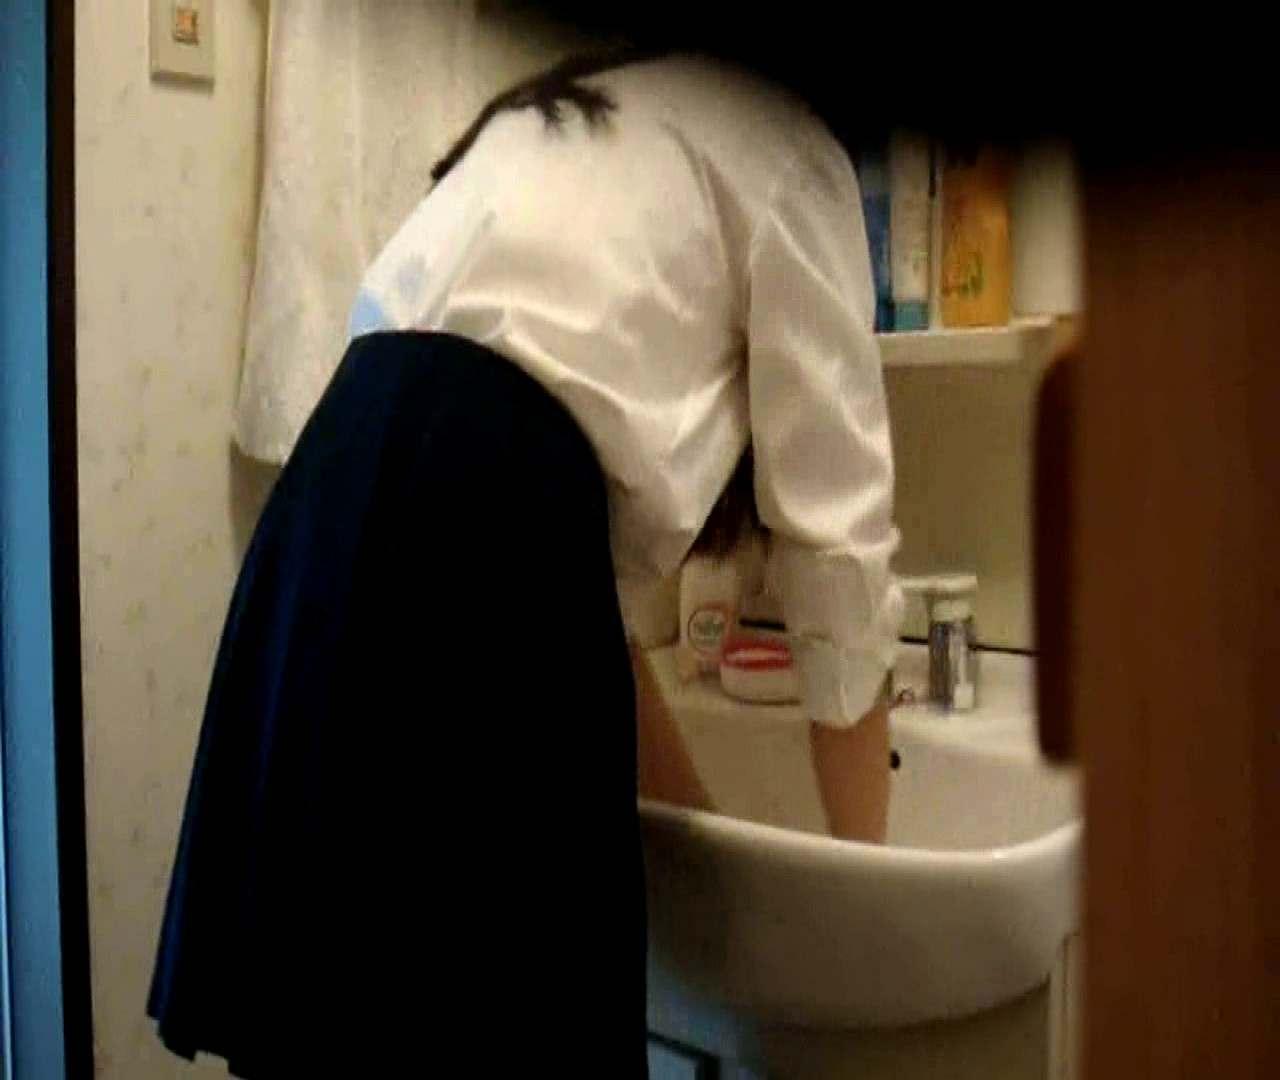 vol.5 まどかが帰宅後の洗顔後にブラを洗ってます。 ギャル達 | 民家  112枚 81